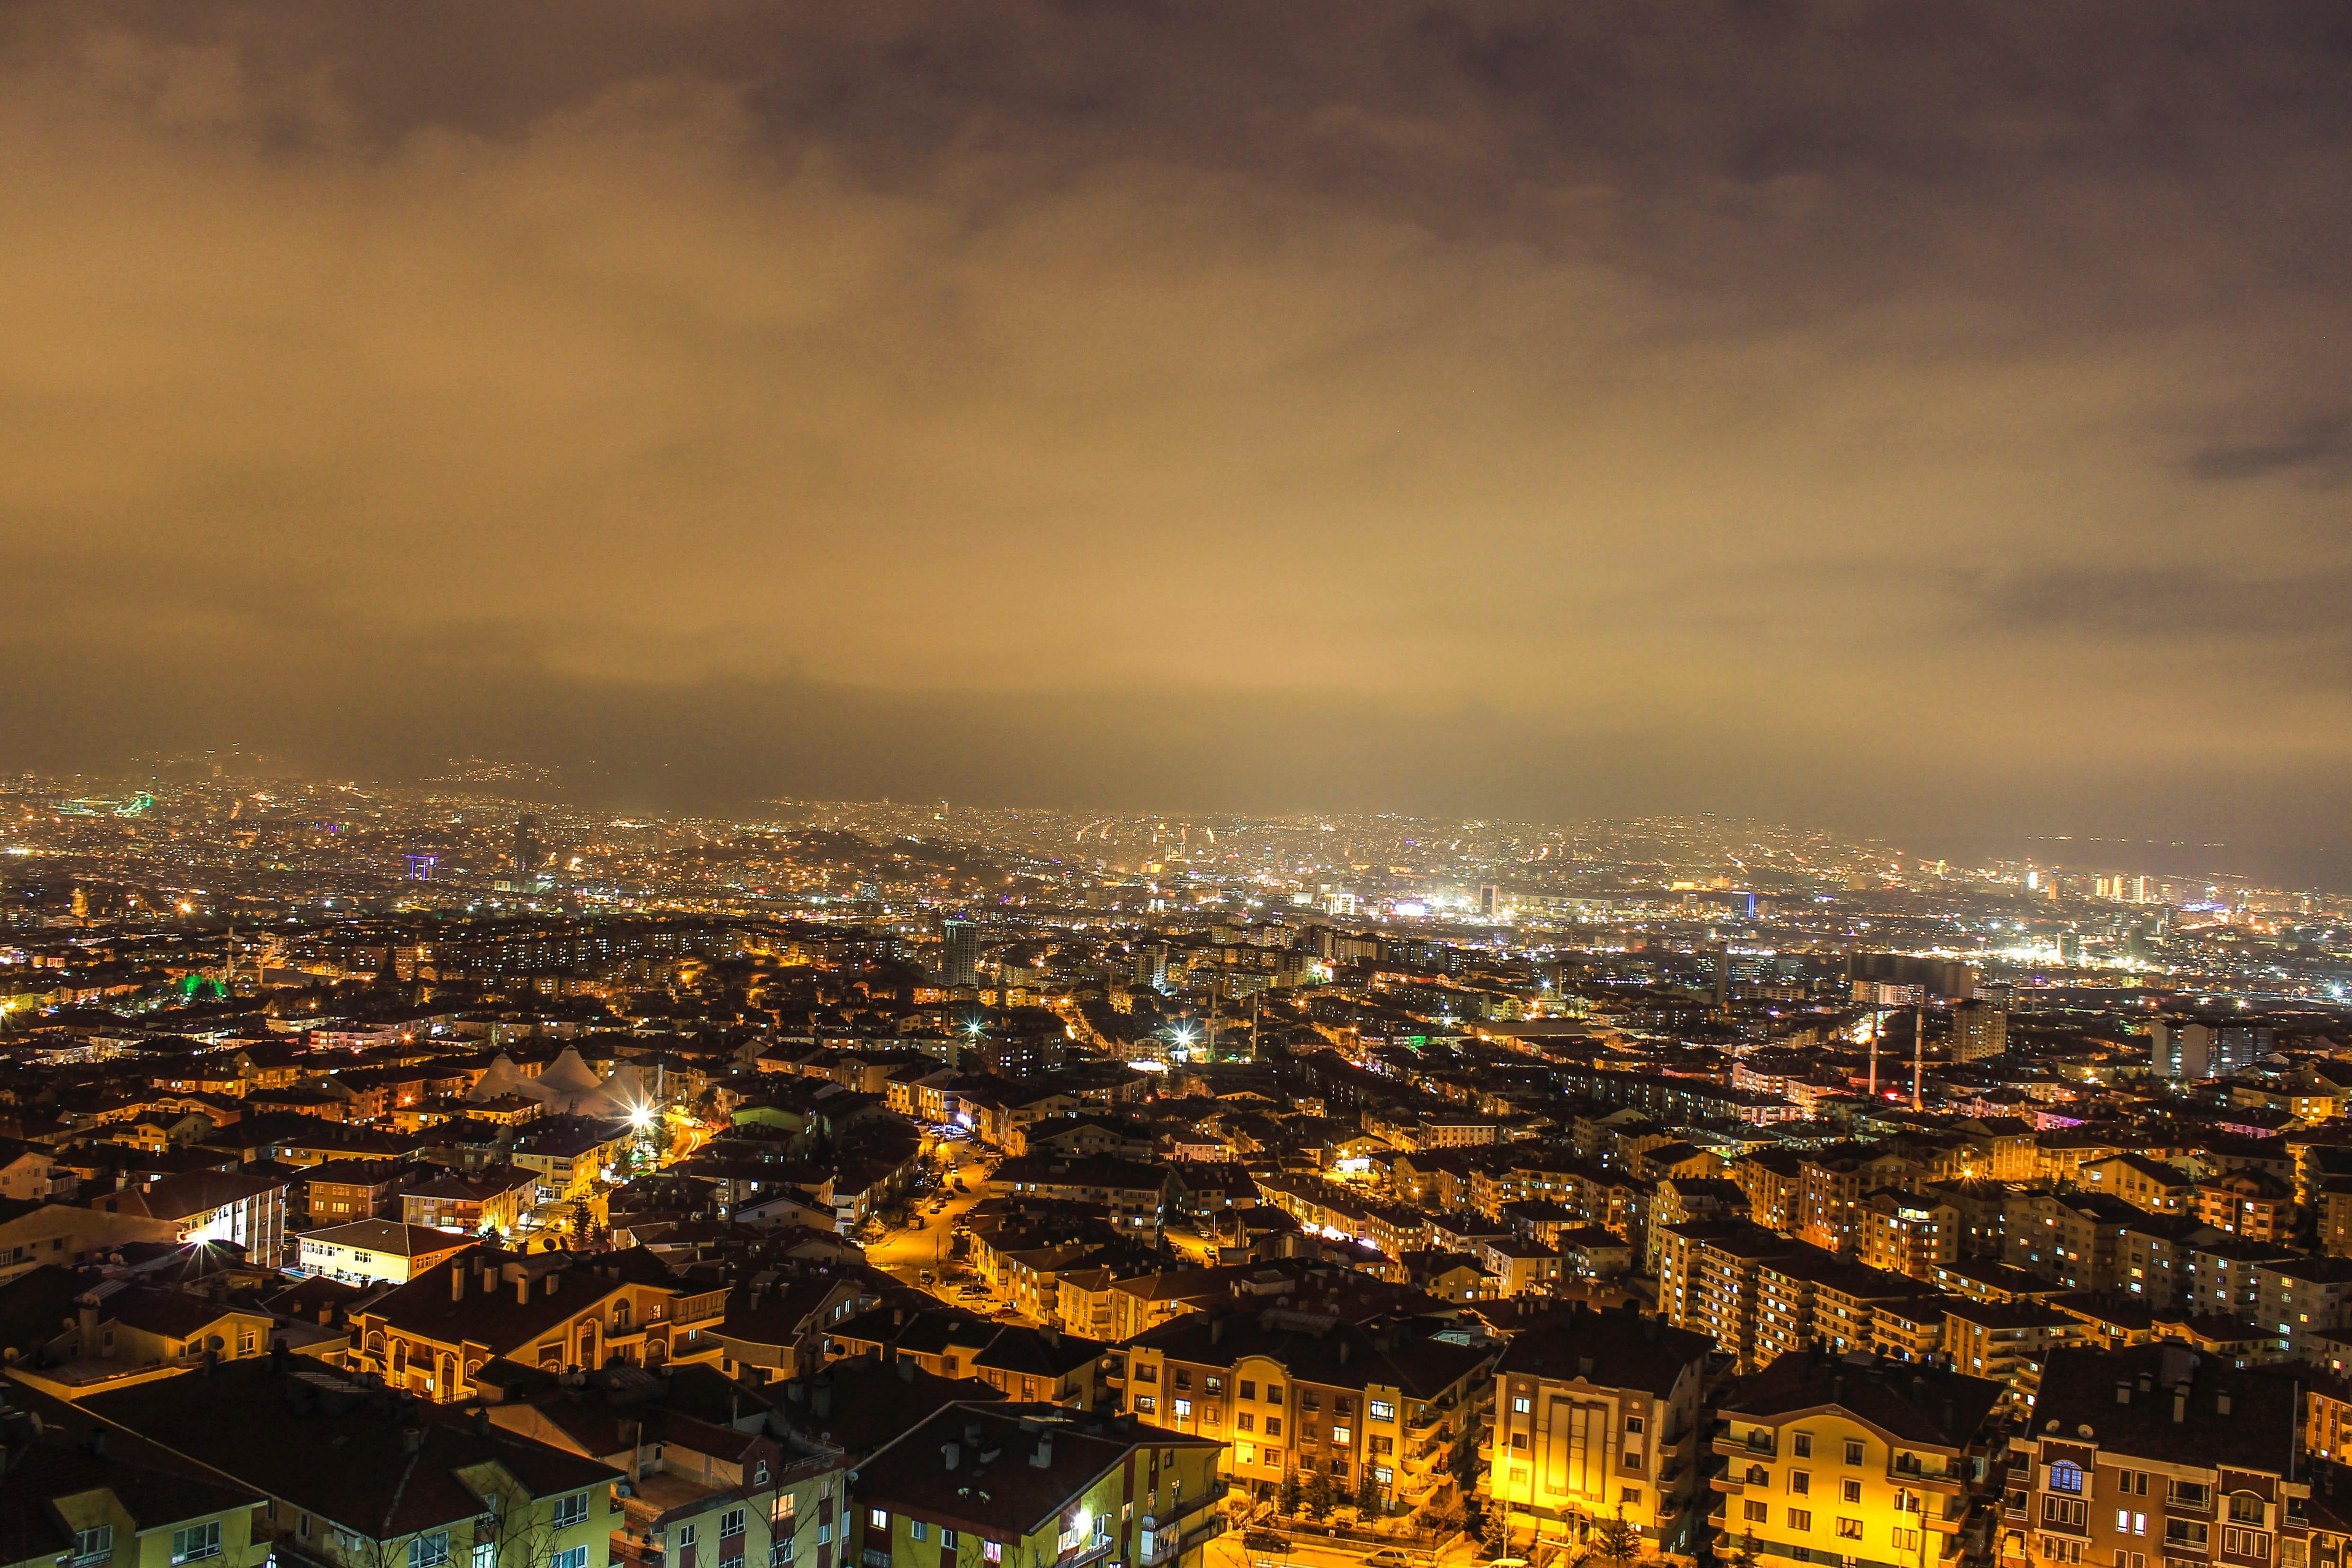 City Top View, Architecture, Buildings, City, Clouds, HQ Photo